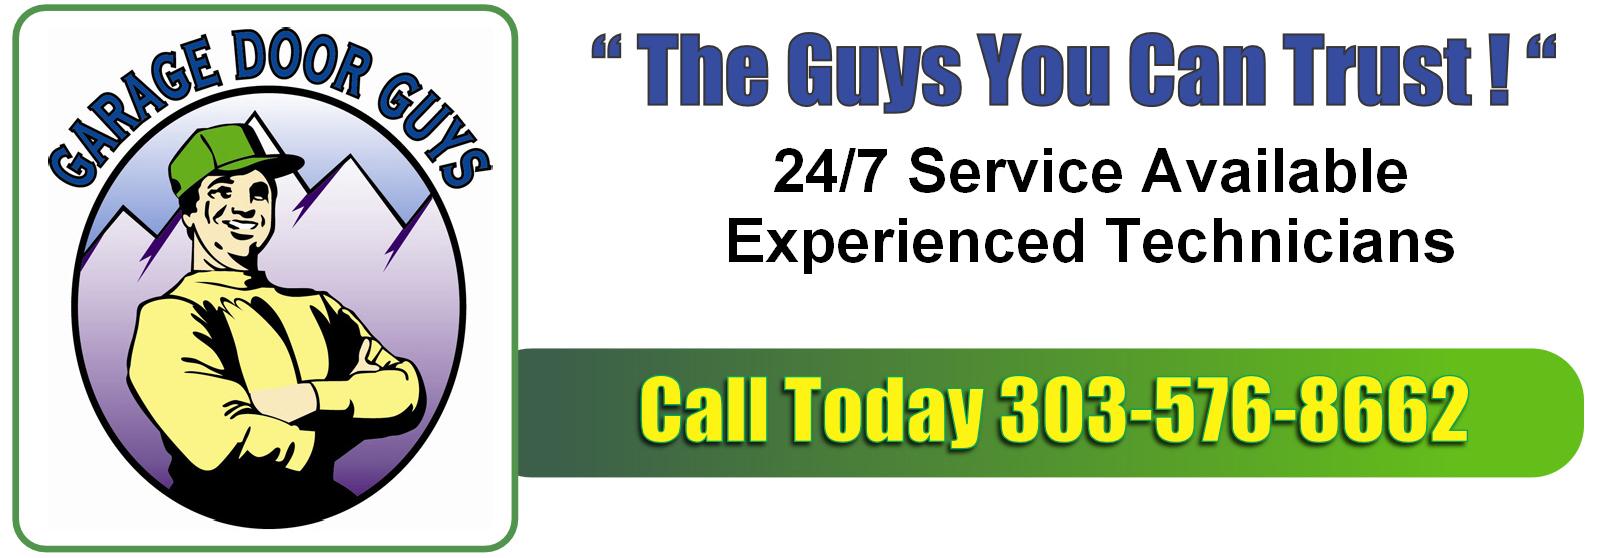 Garage Door Repair Parker | Installation, Services, Company ...